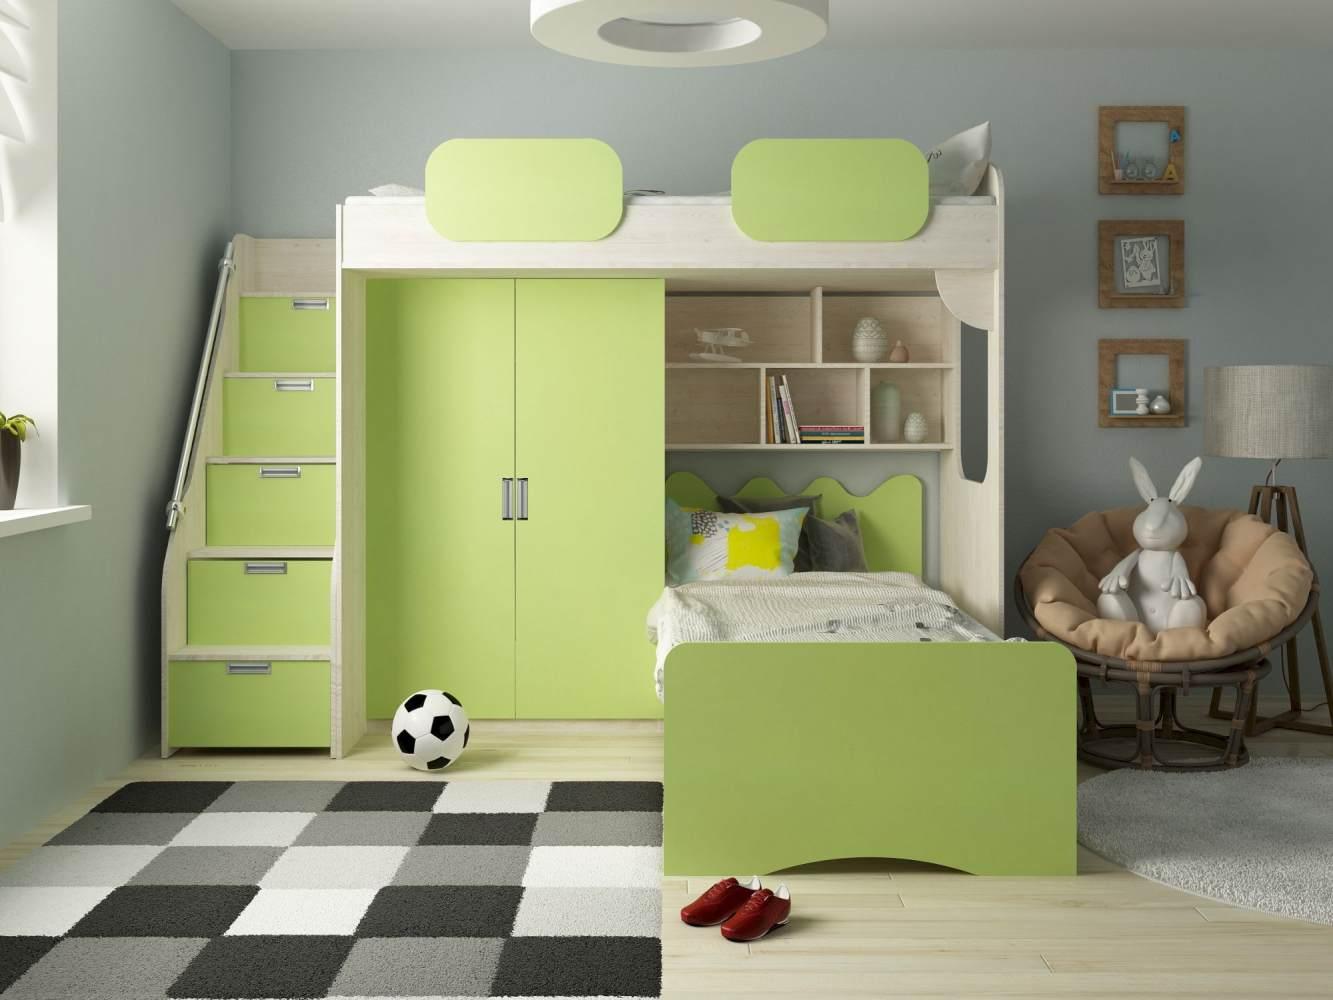 Etagenbett 'Geko' grün Bild 1